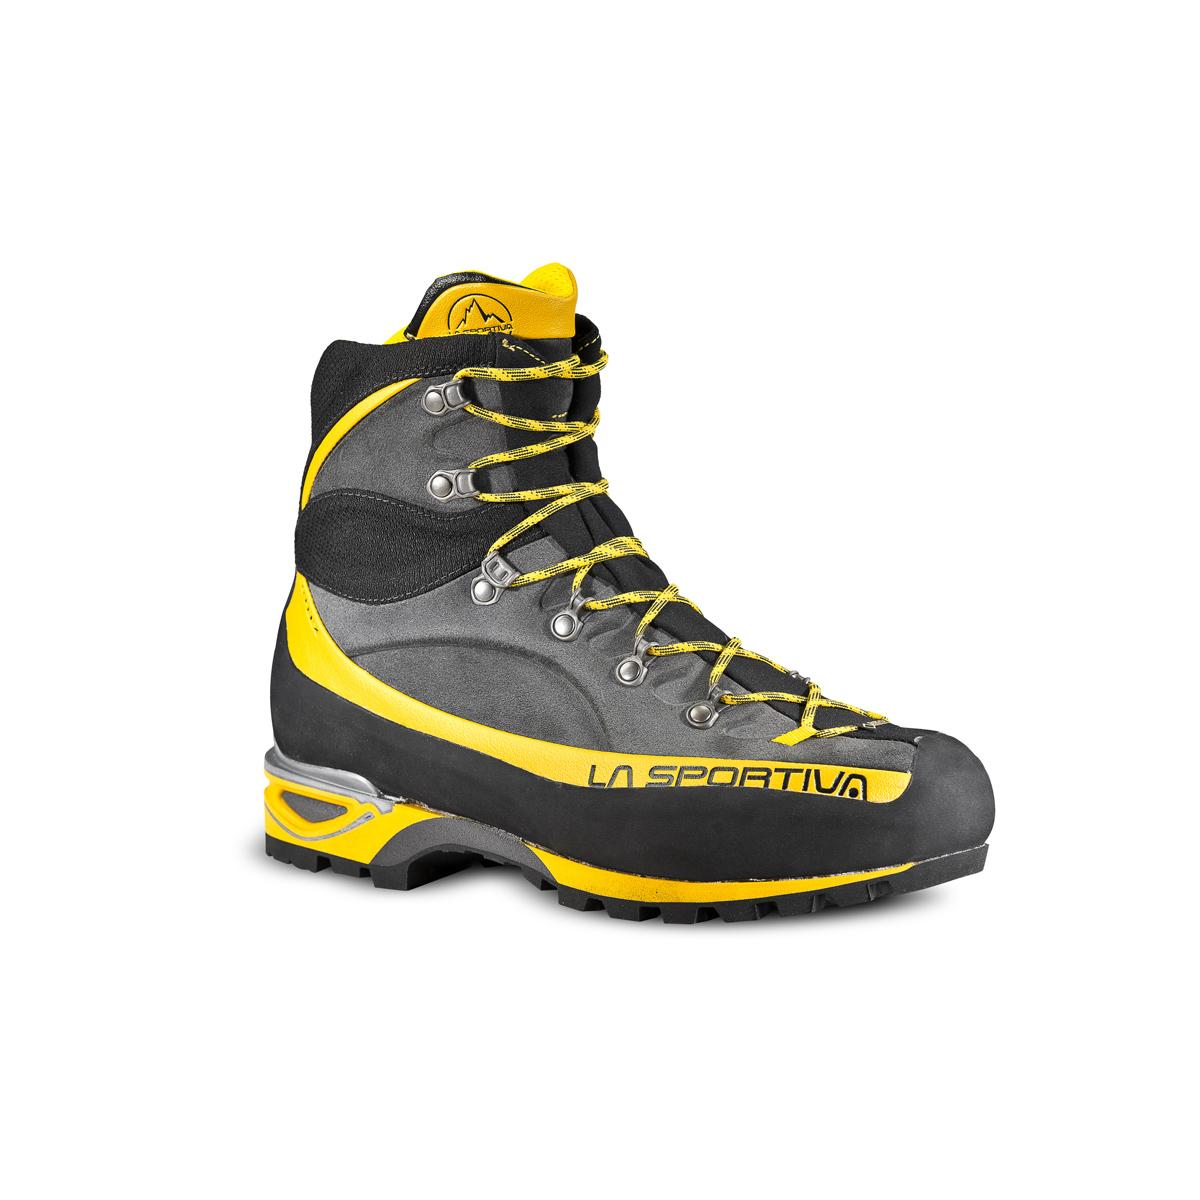 La Sportiva Trango Alp Evo Gtx Mountaineering Boots